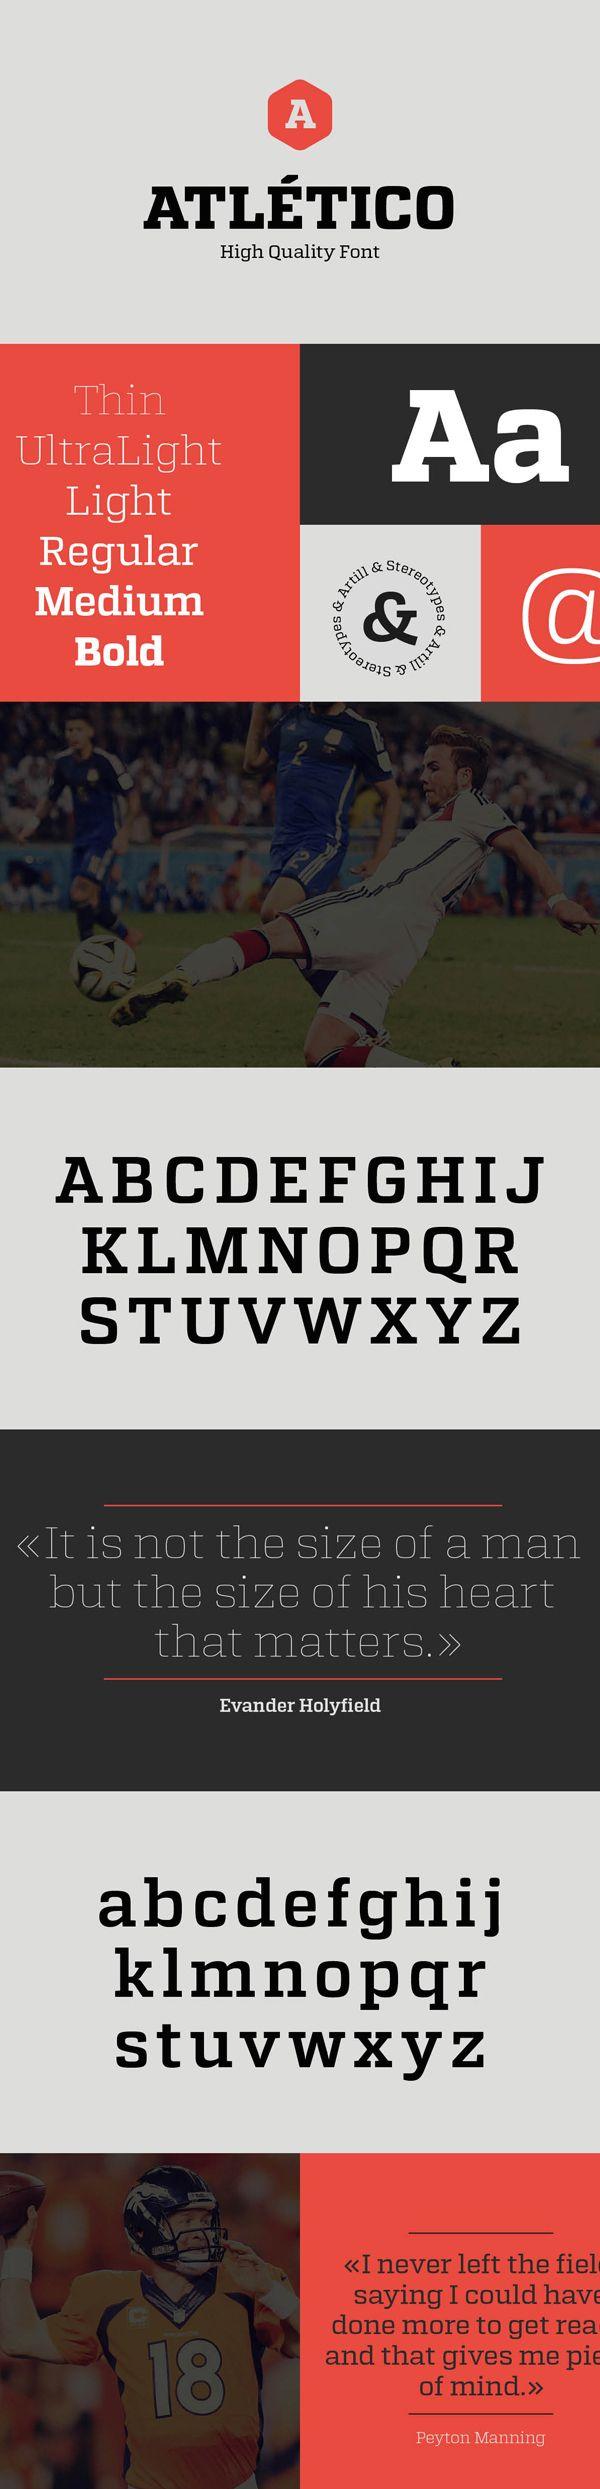 Gorgeous free slab serif #font Atletico